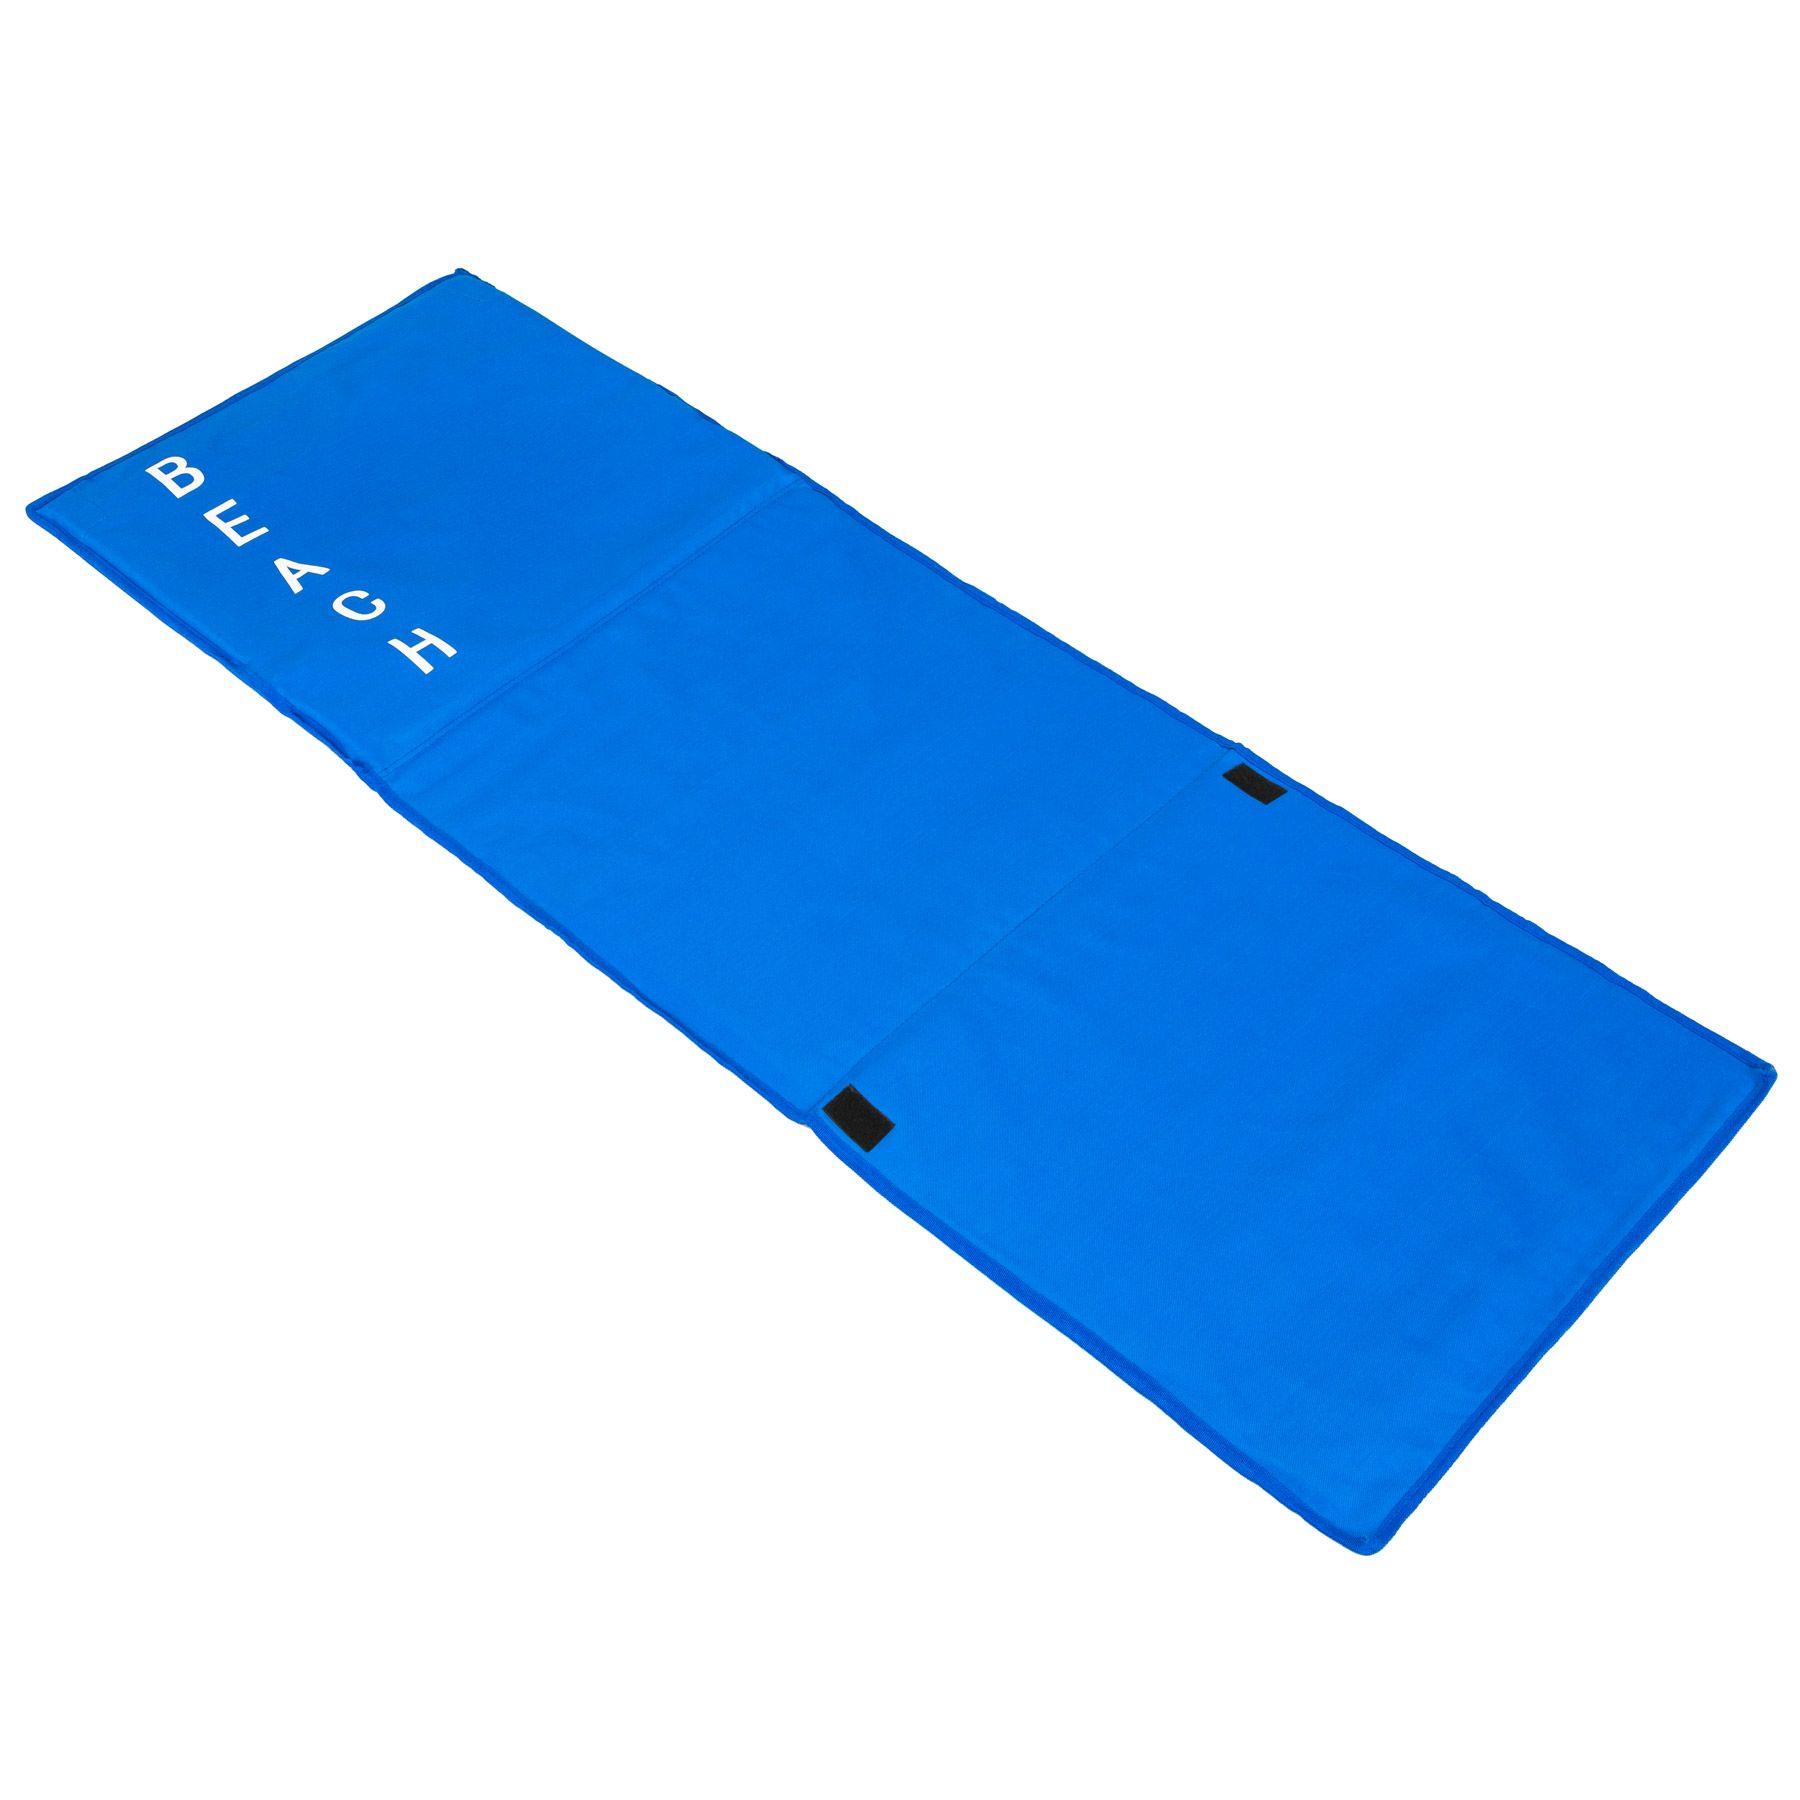 gepolsterte strandmatte verstellbare r ckenlehne matte strand liege lehne blau ebay. Black Bedroom Furniture Sets. Home Design Ideas